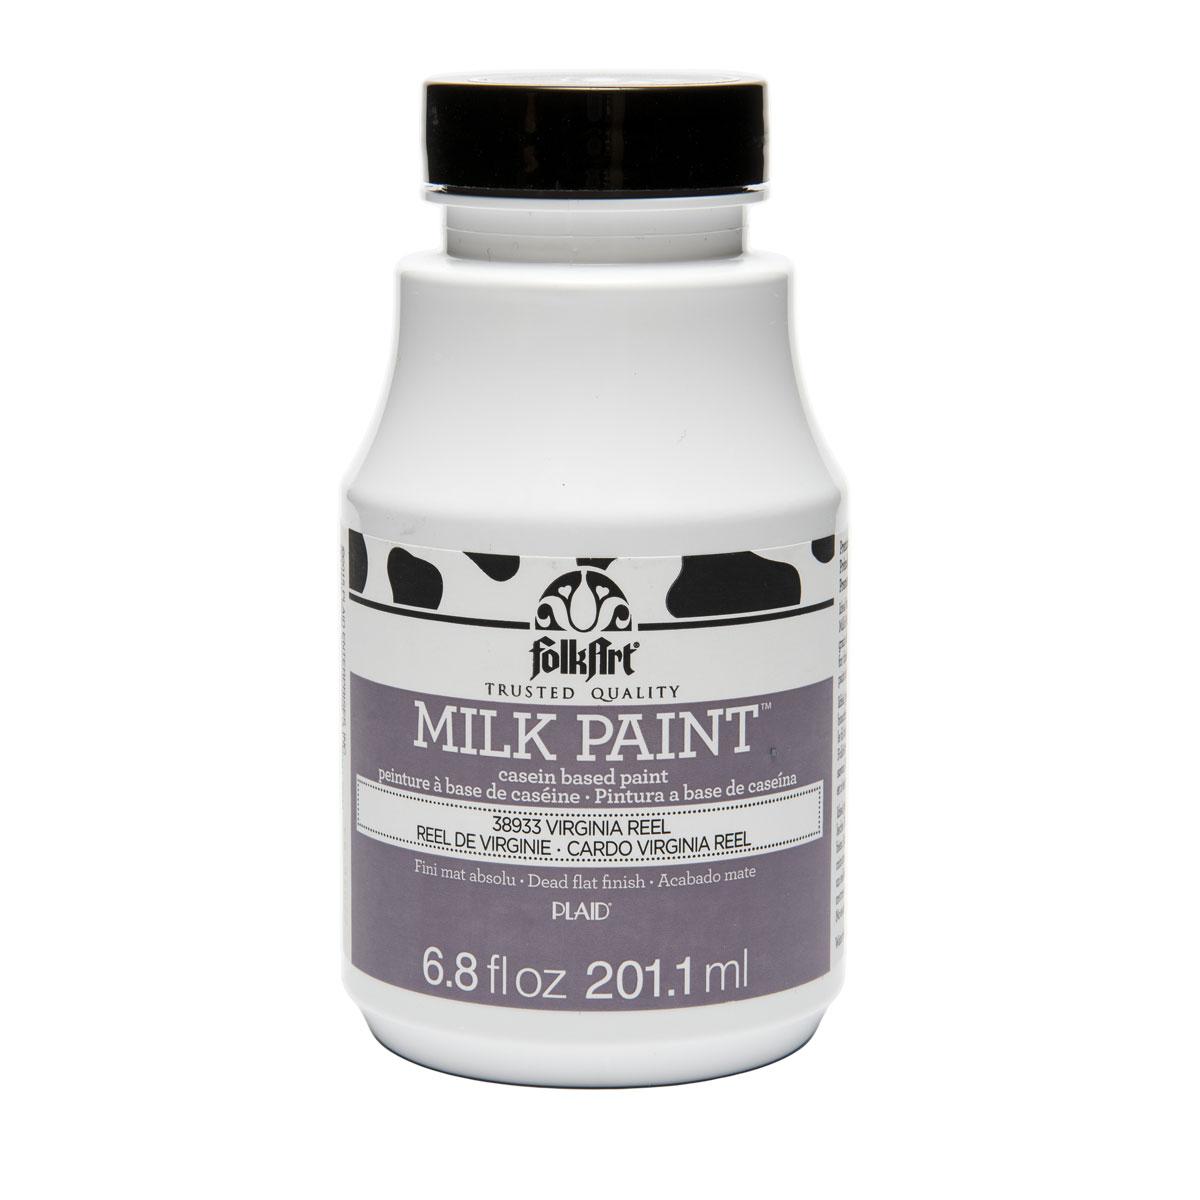 FolkArt ® Milk Paint™ - Virginia Reel, 6.8 oz.